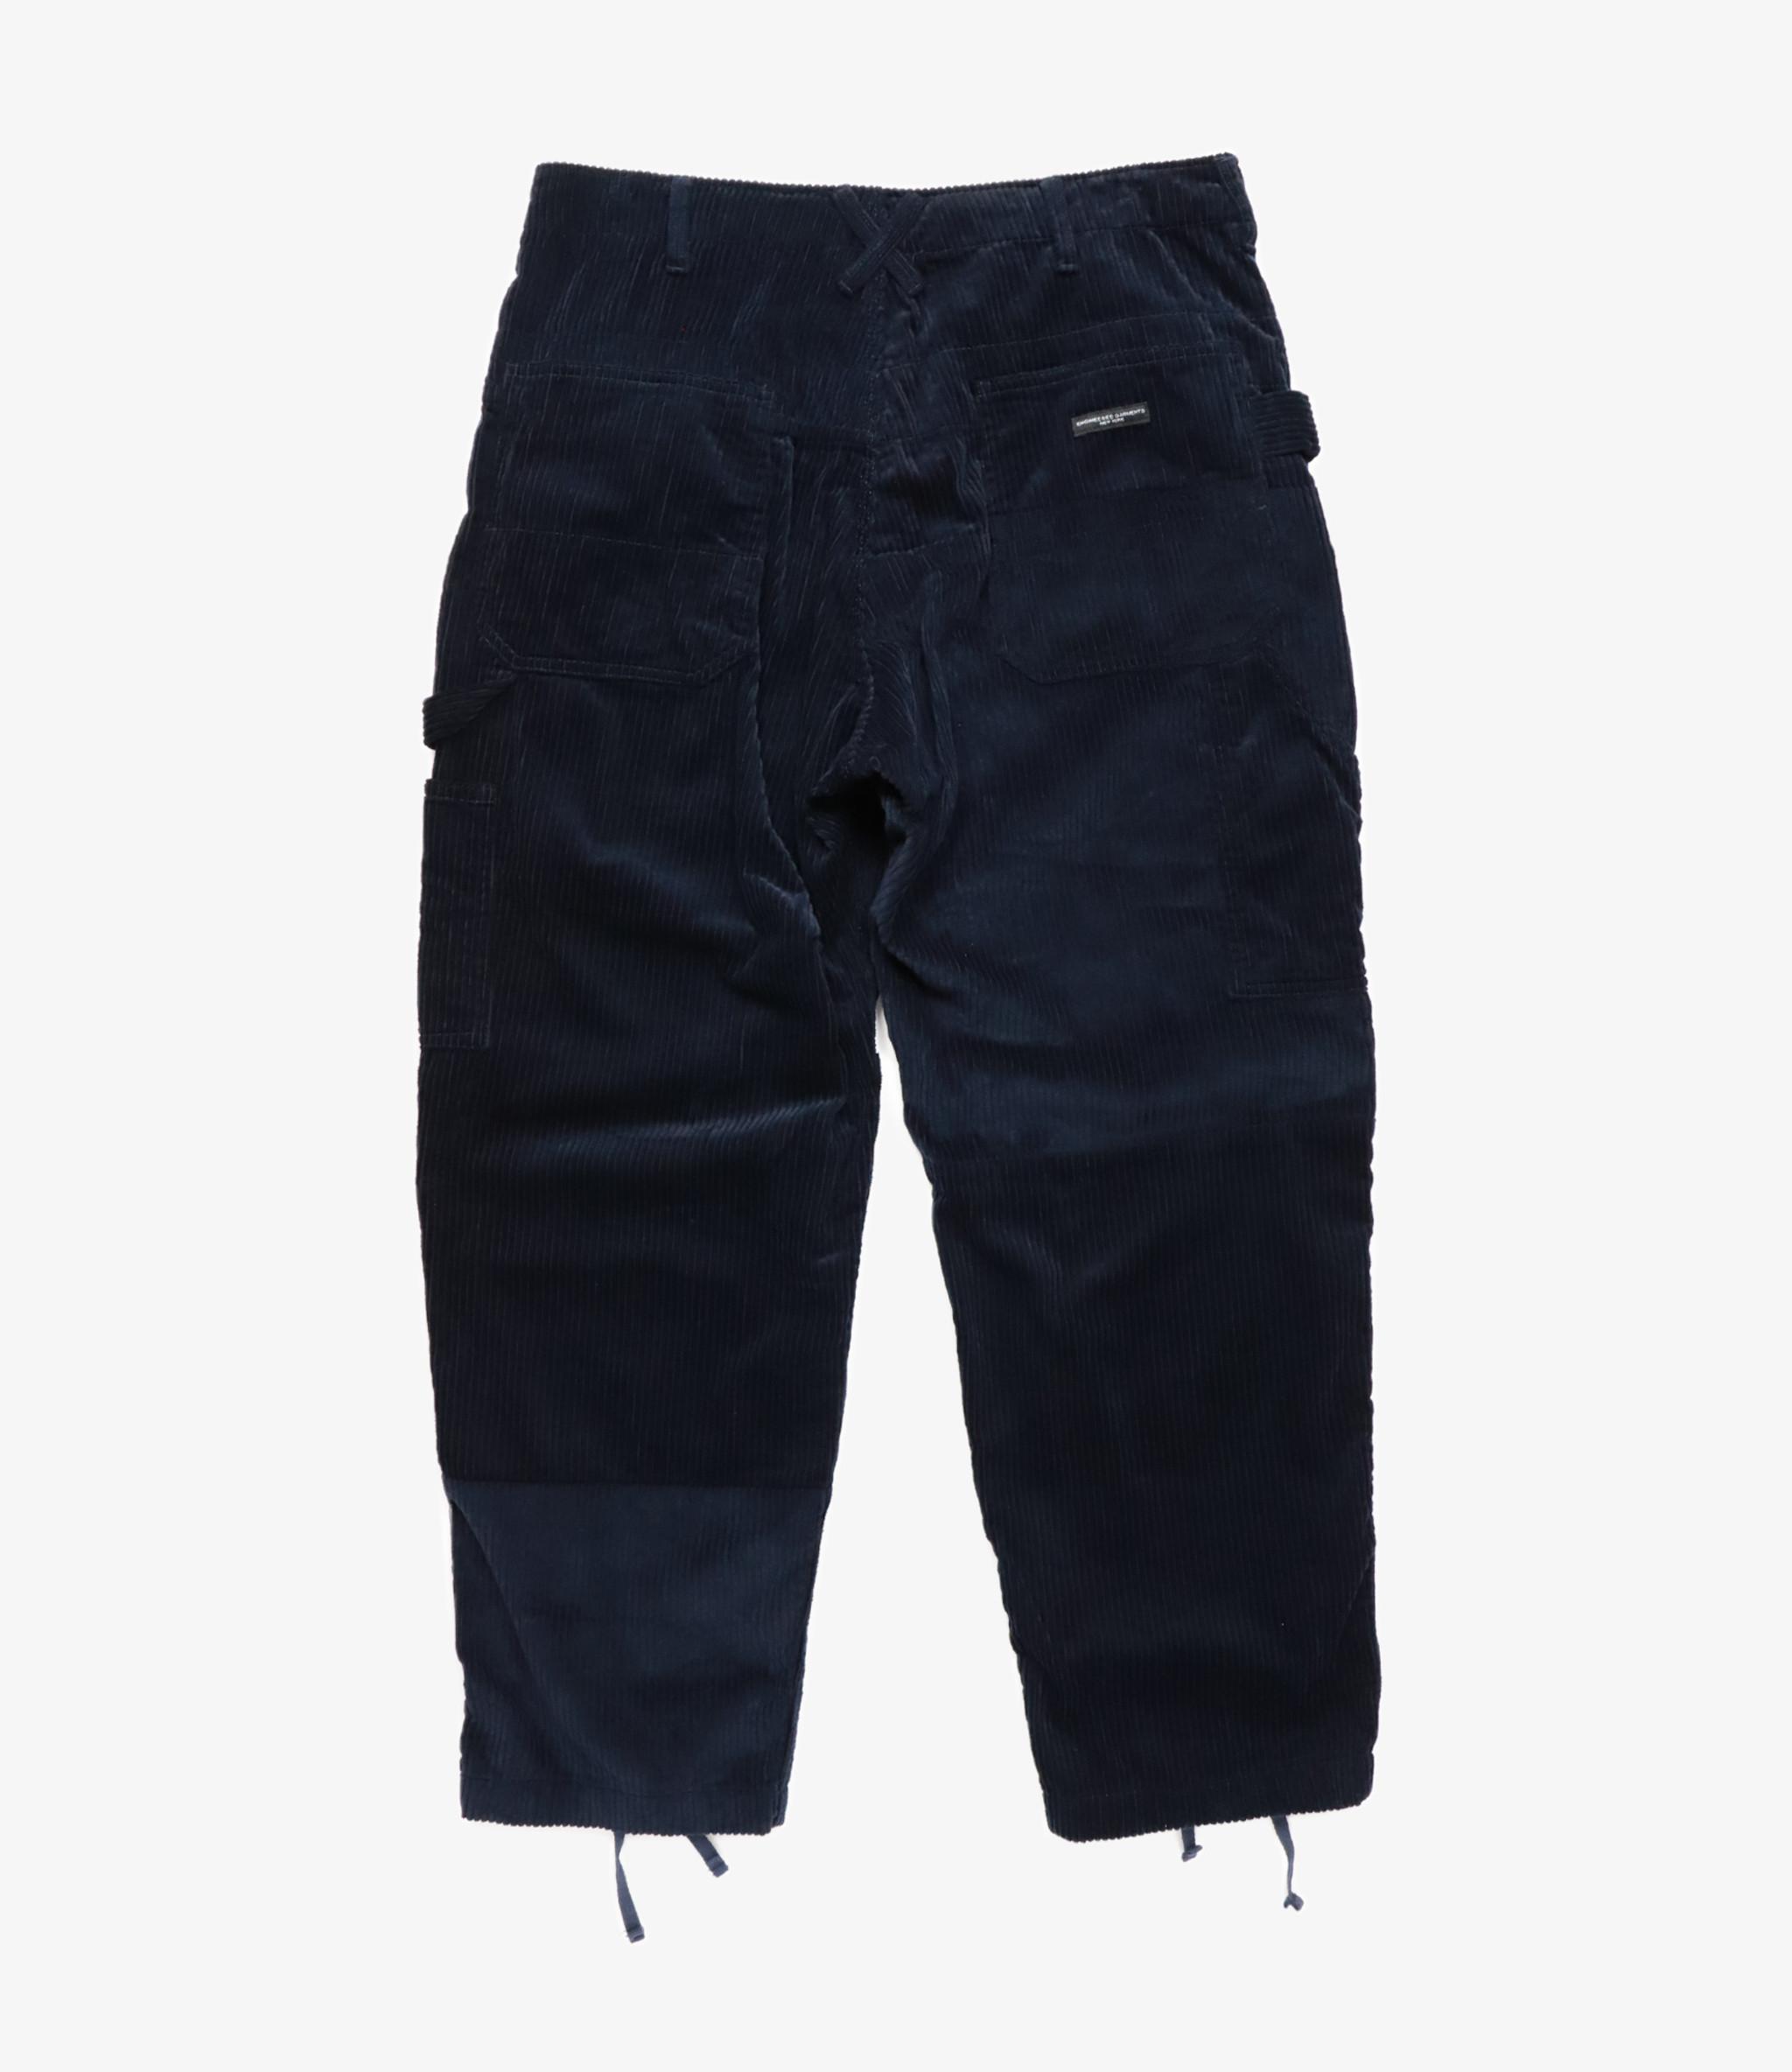 Engineered Garments Painter Pant - Navy Cotton 6W Corduroy